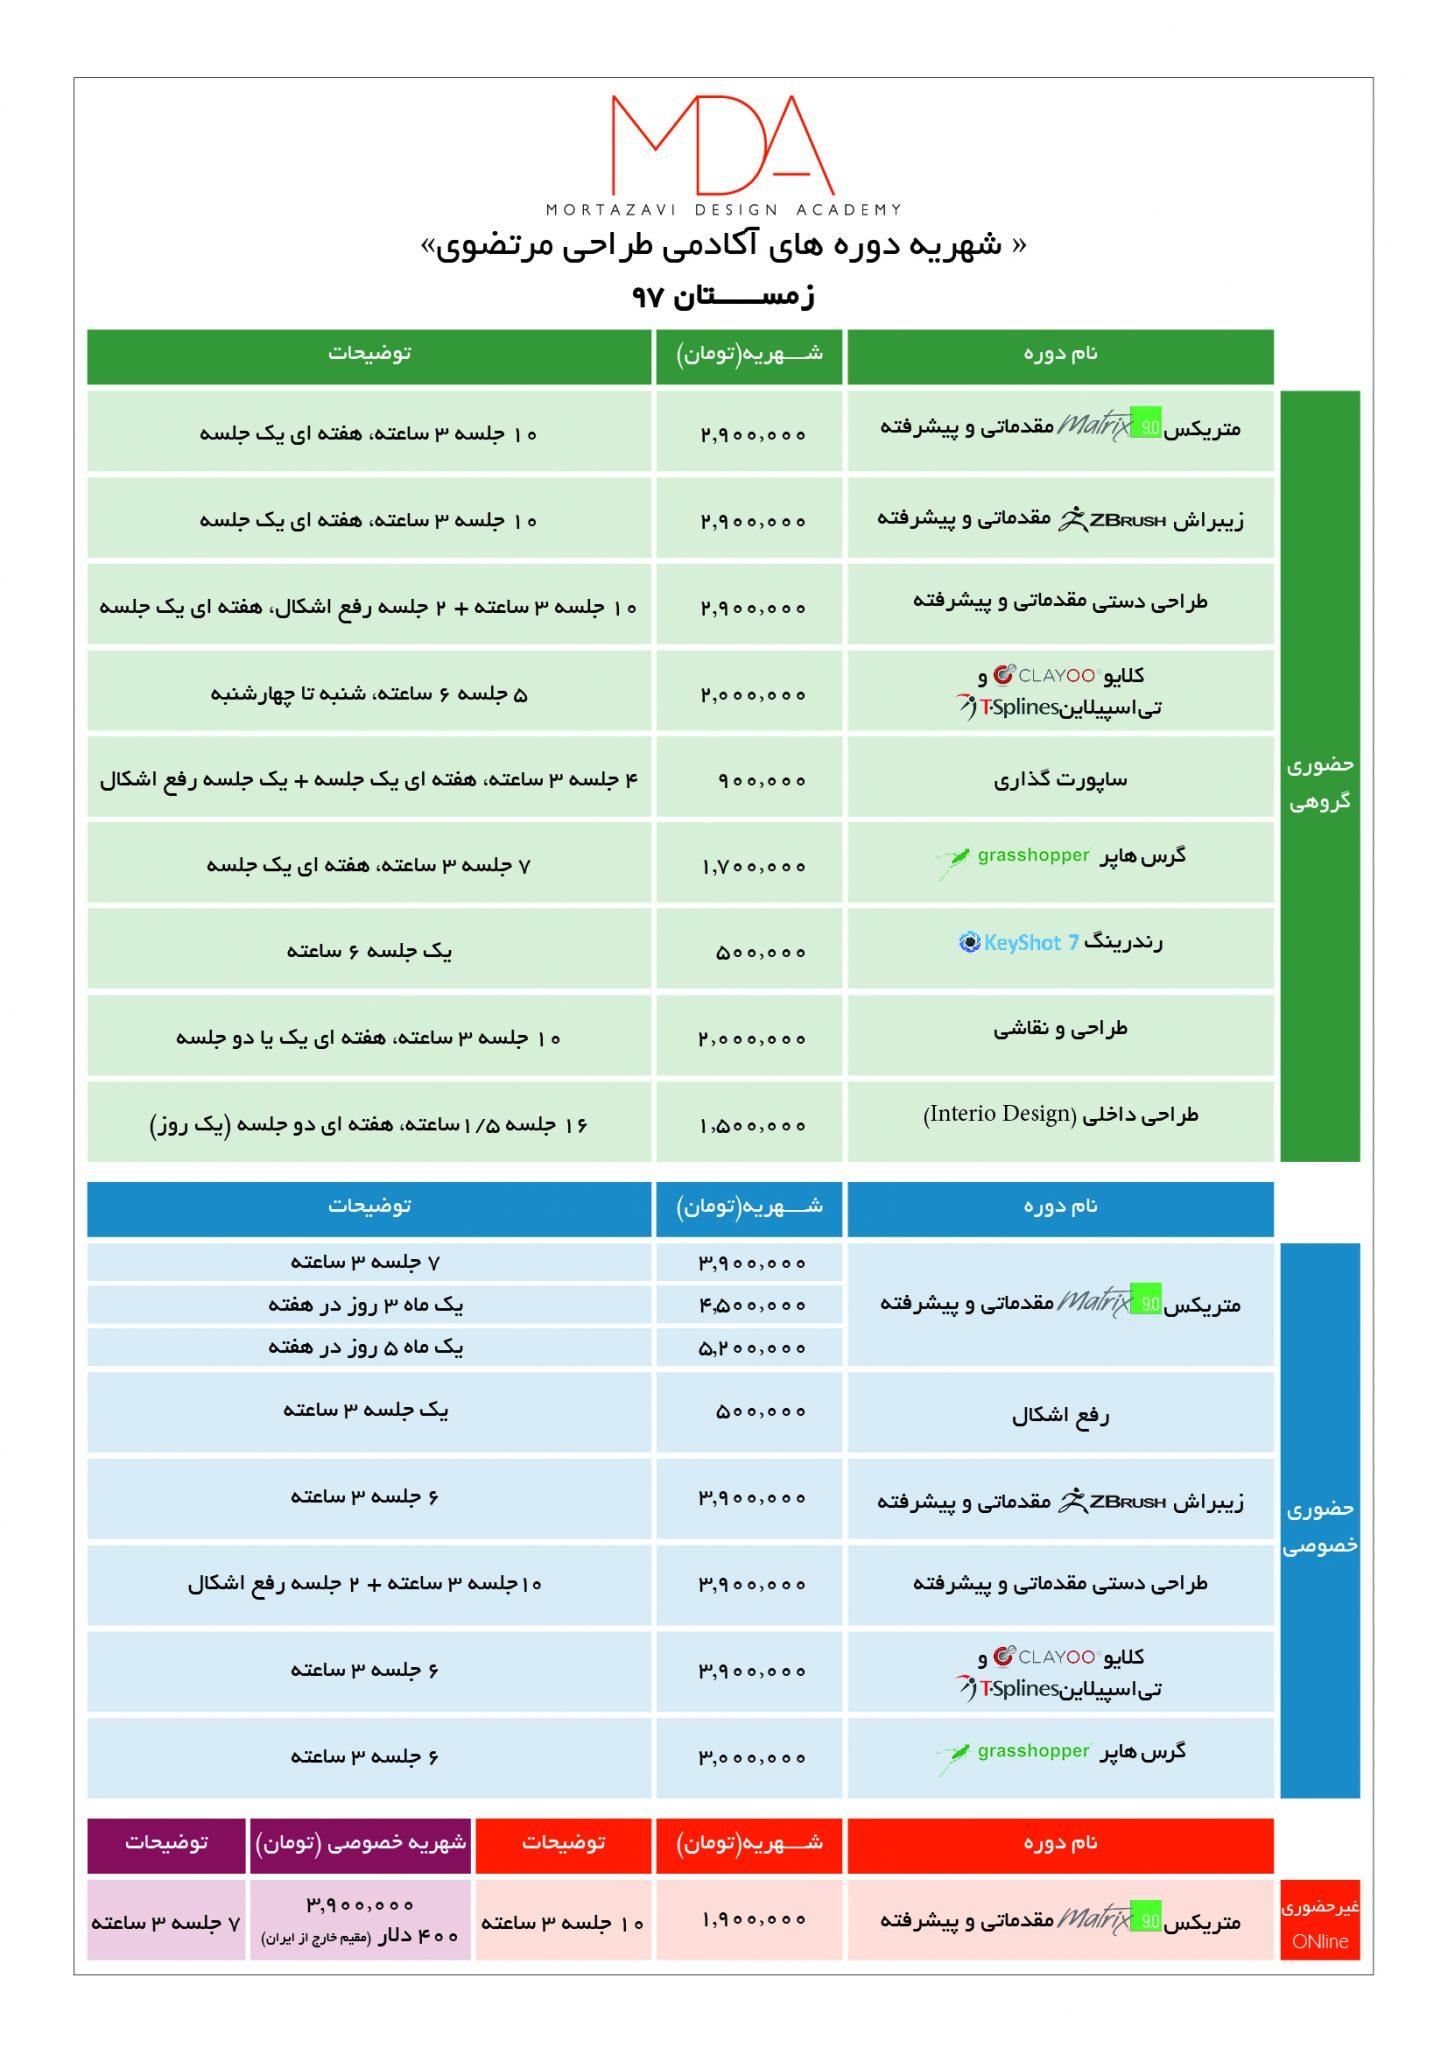 Price List MDA 9711 1